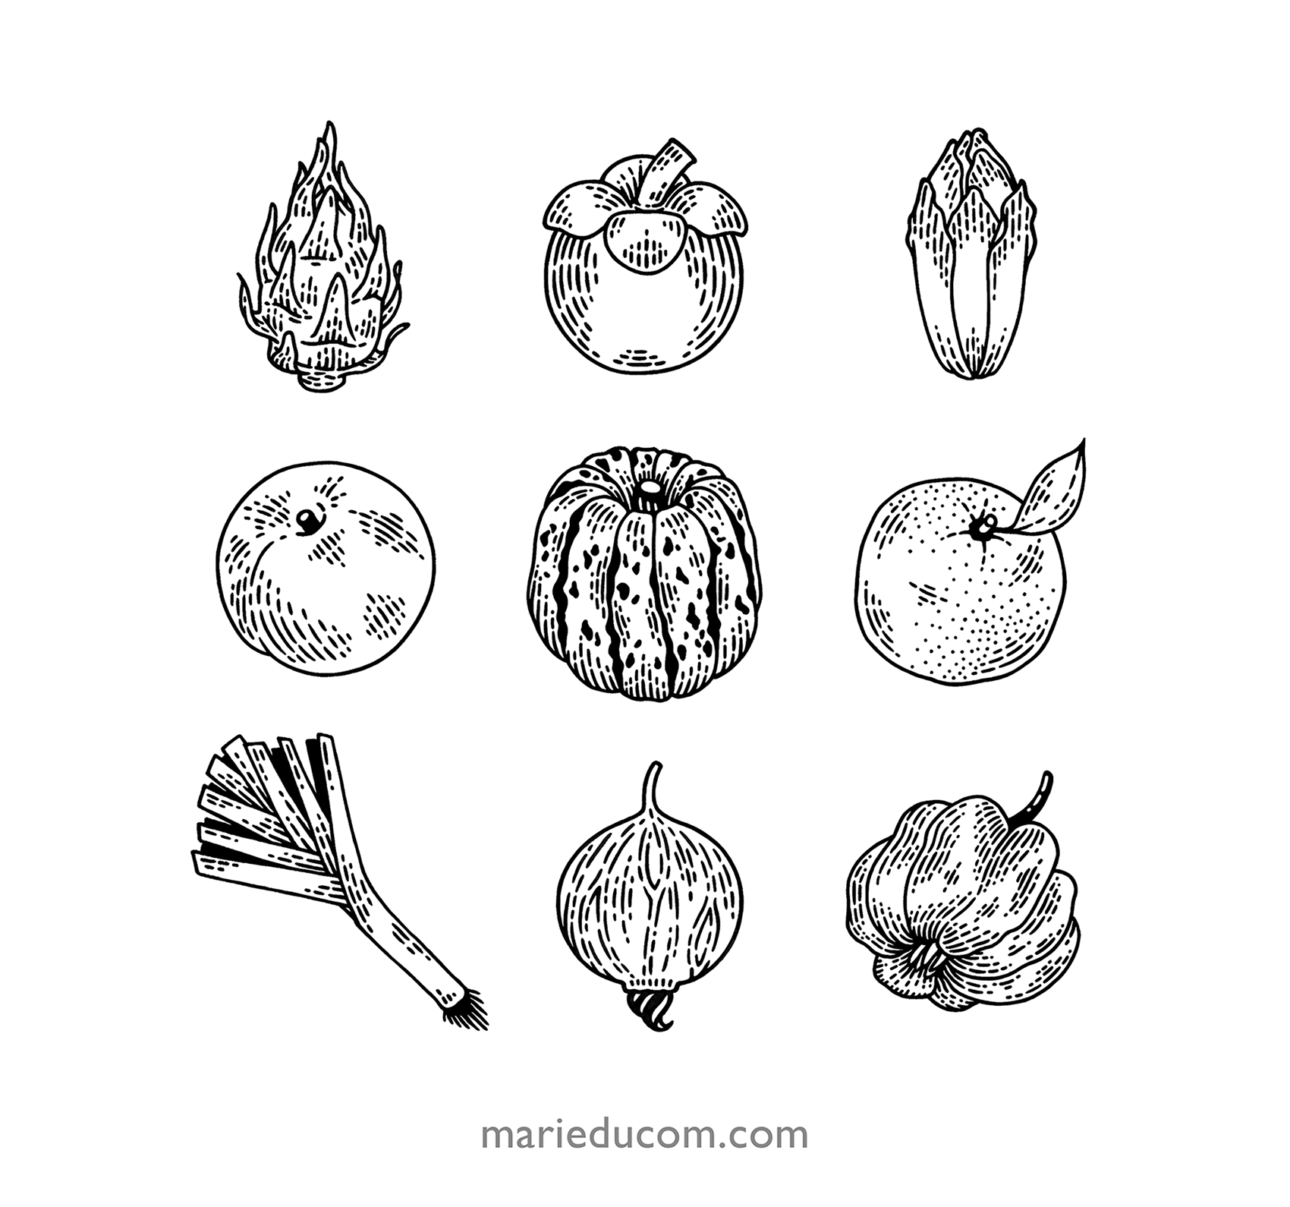 Fruits-vegetables-2-Marie-Ducom-2021